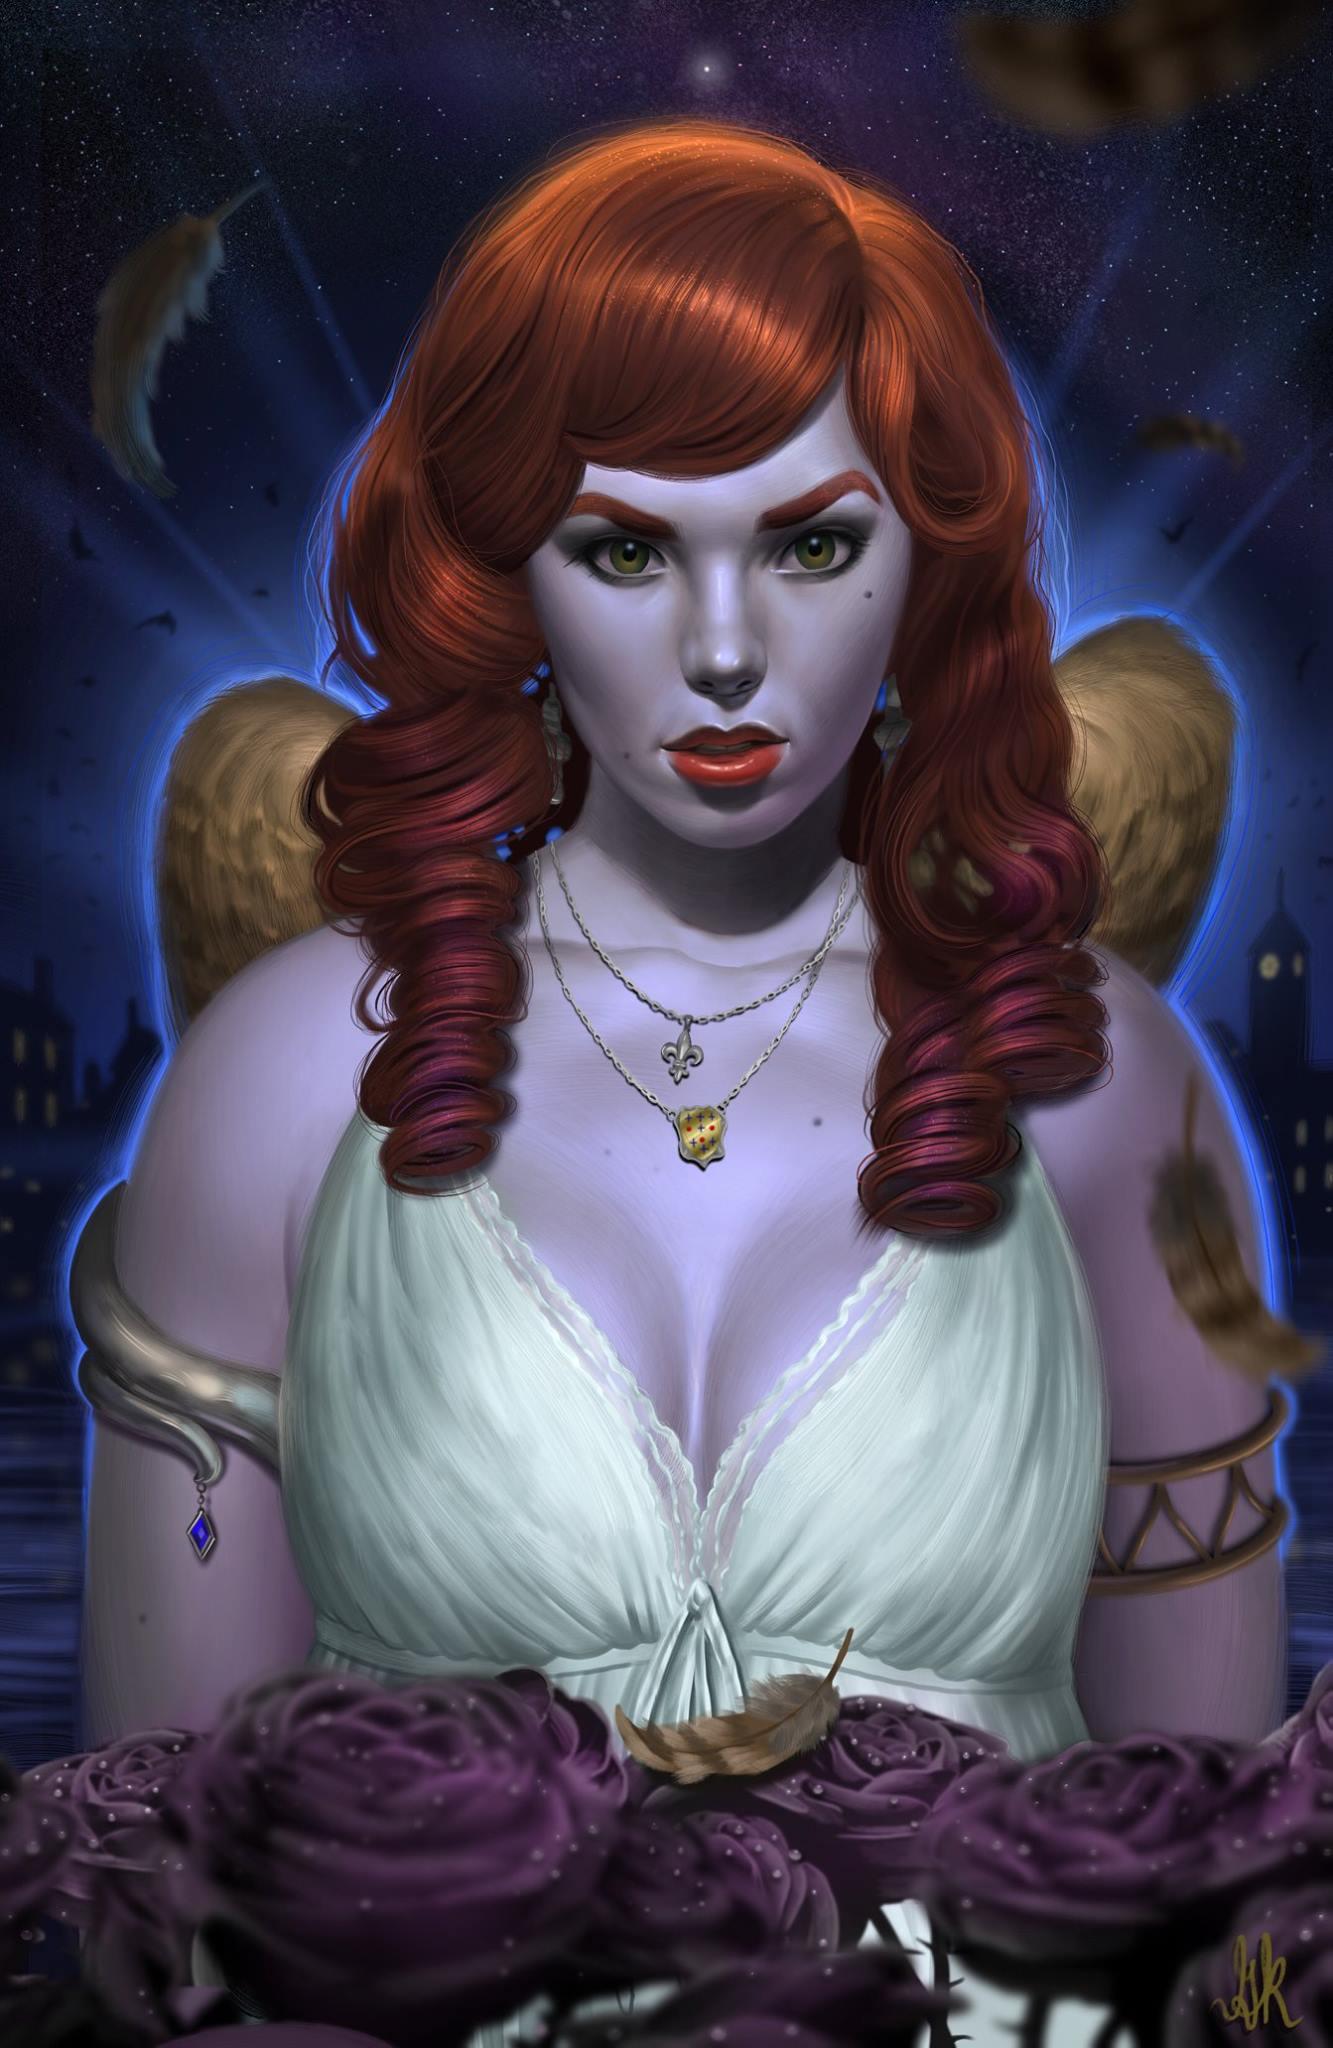 The Archangel of Argenton